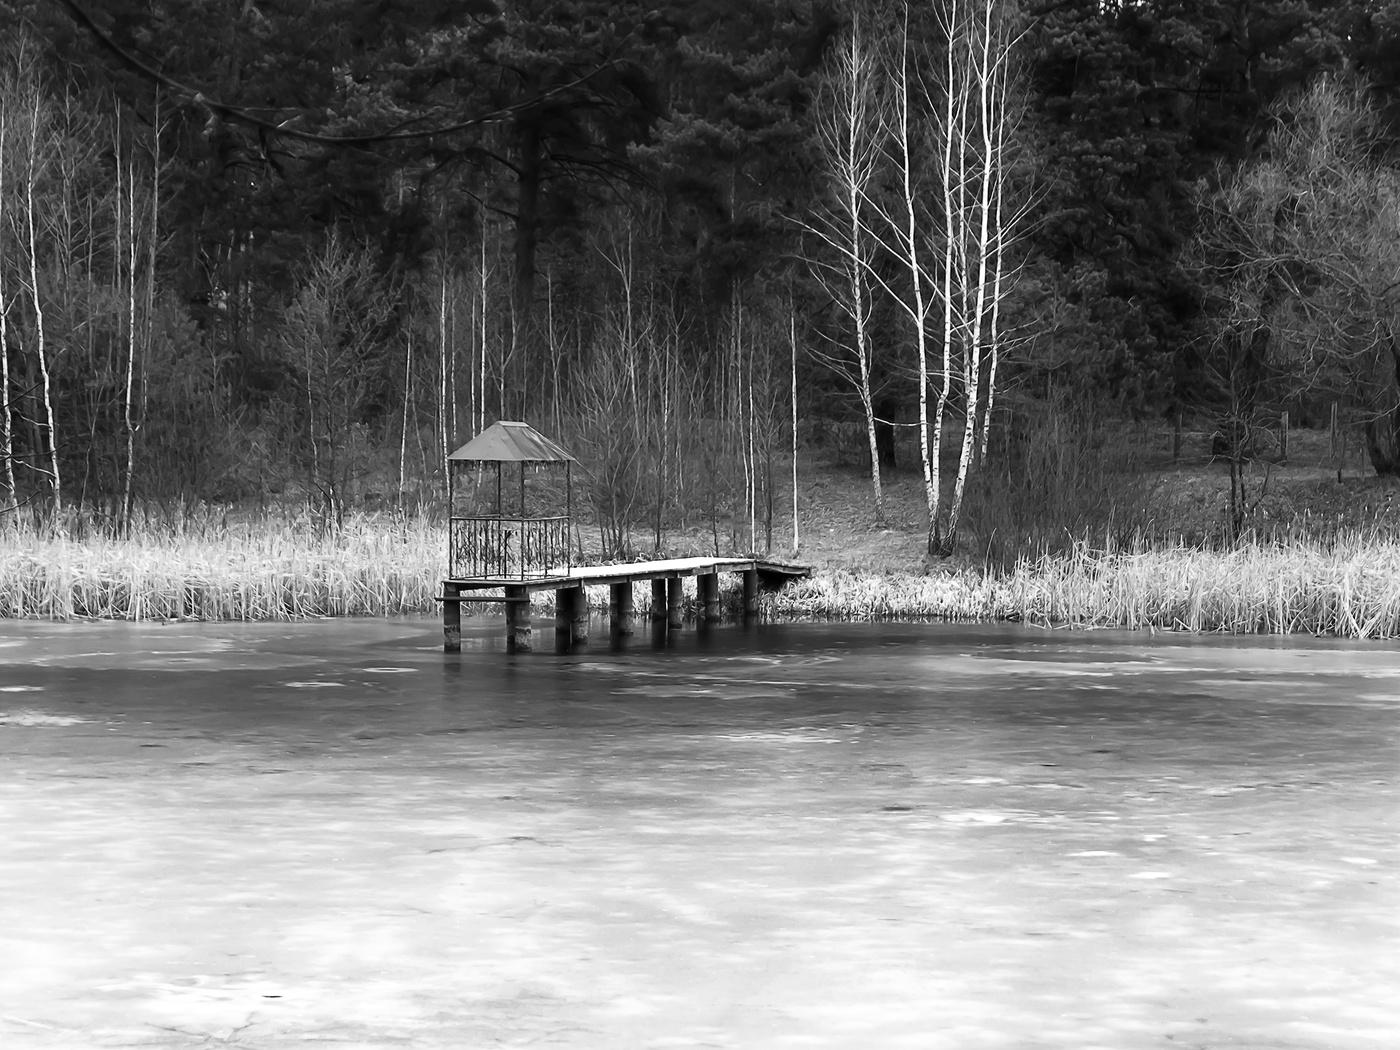 берегите озера картинки фабричная